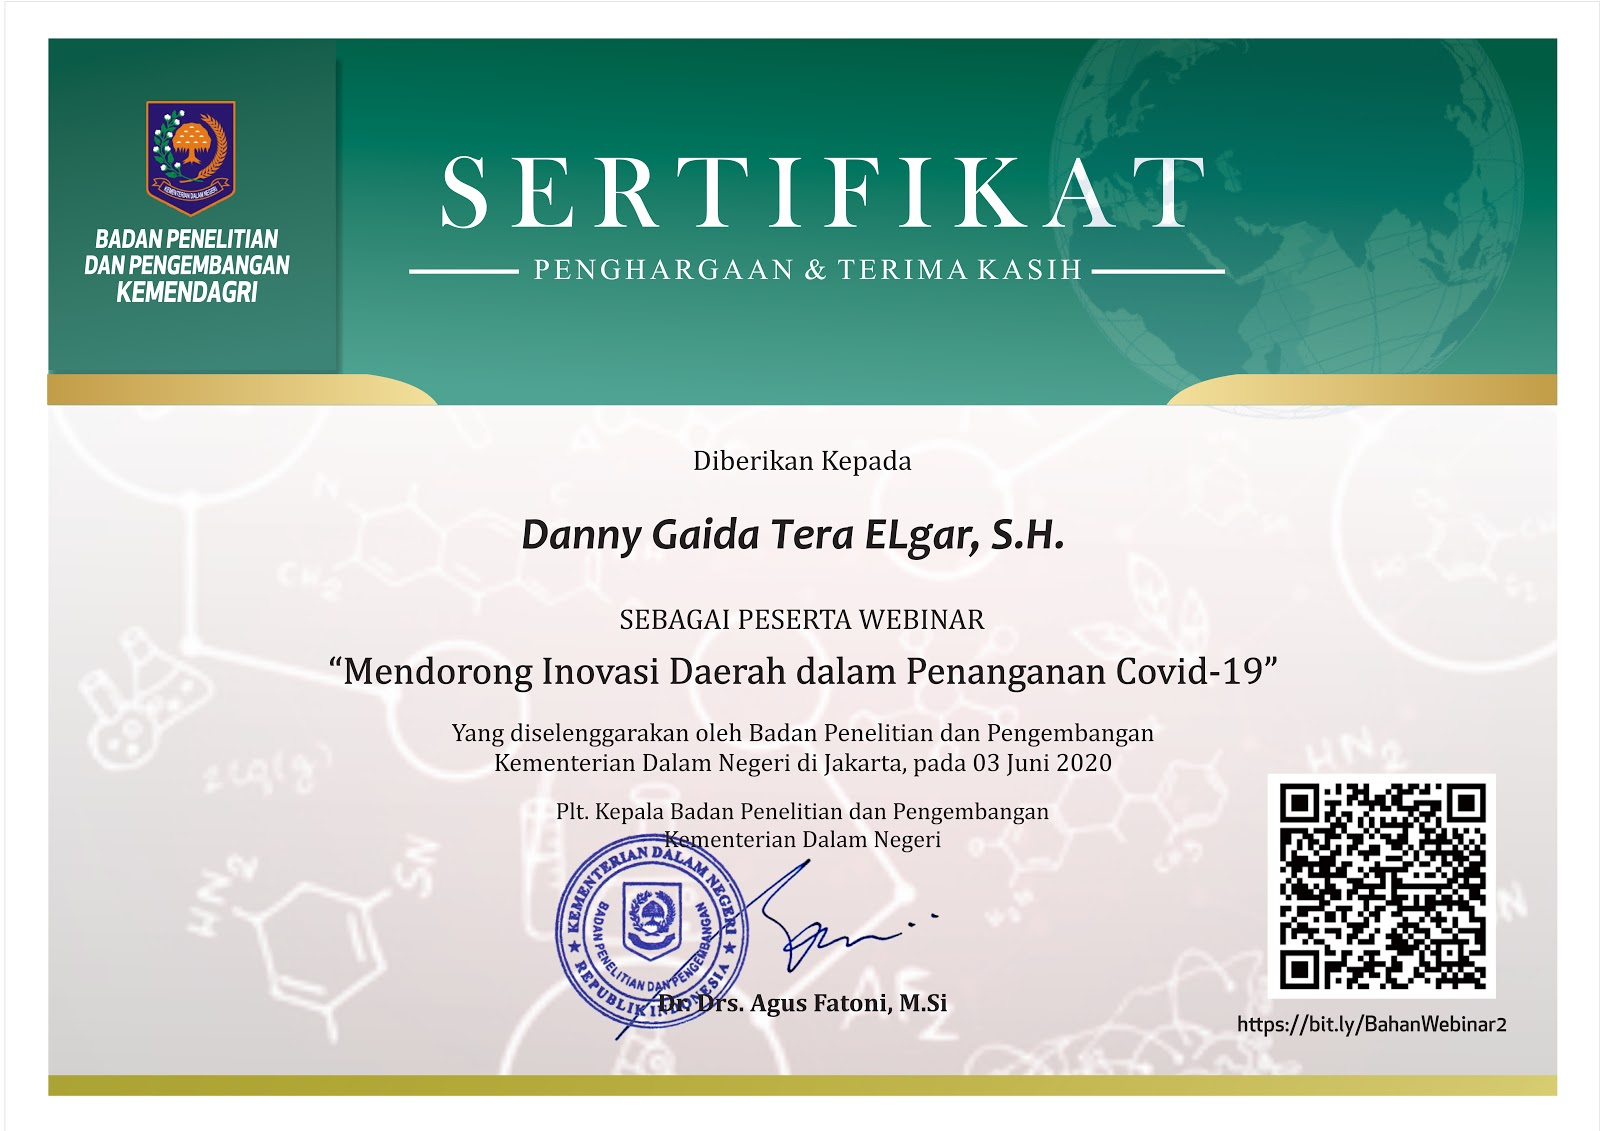 "Sertifikat Penghargaan Badan Penelitian dan Pengembangan Kementerian Dalam Negeri Republik Indonesia (Kemendagri RI) ""Mendorong Inovasi Daerah dalam Penanganan Covid-19"""